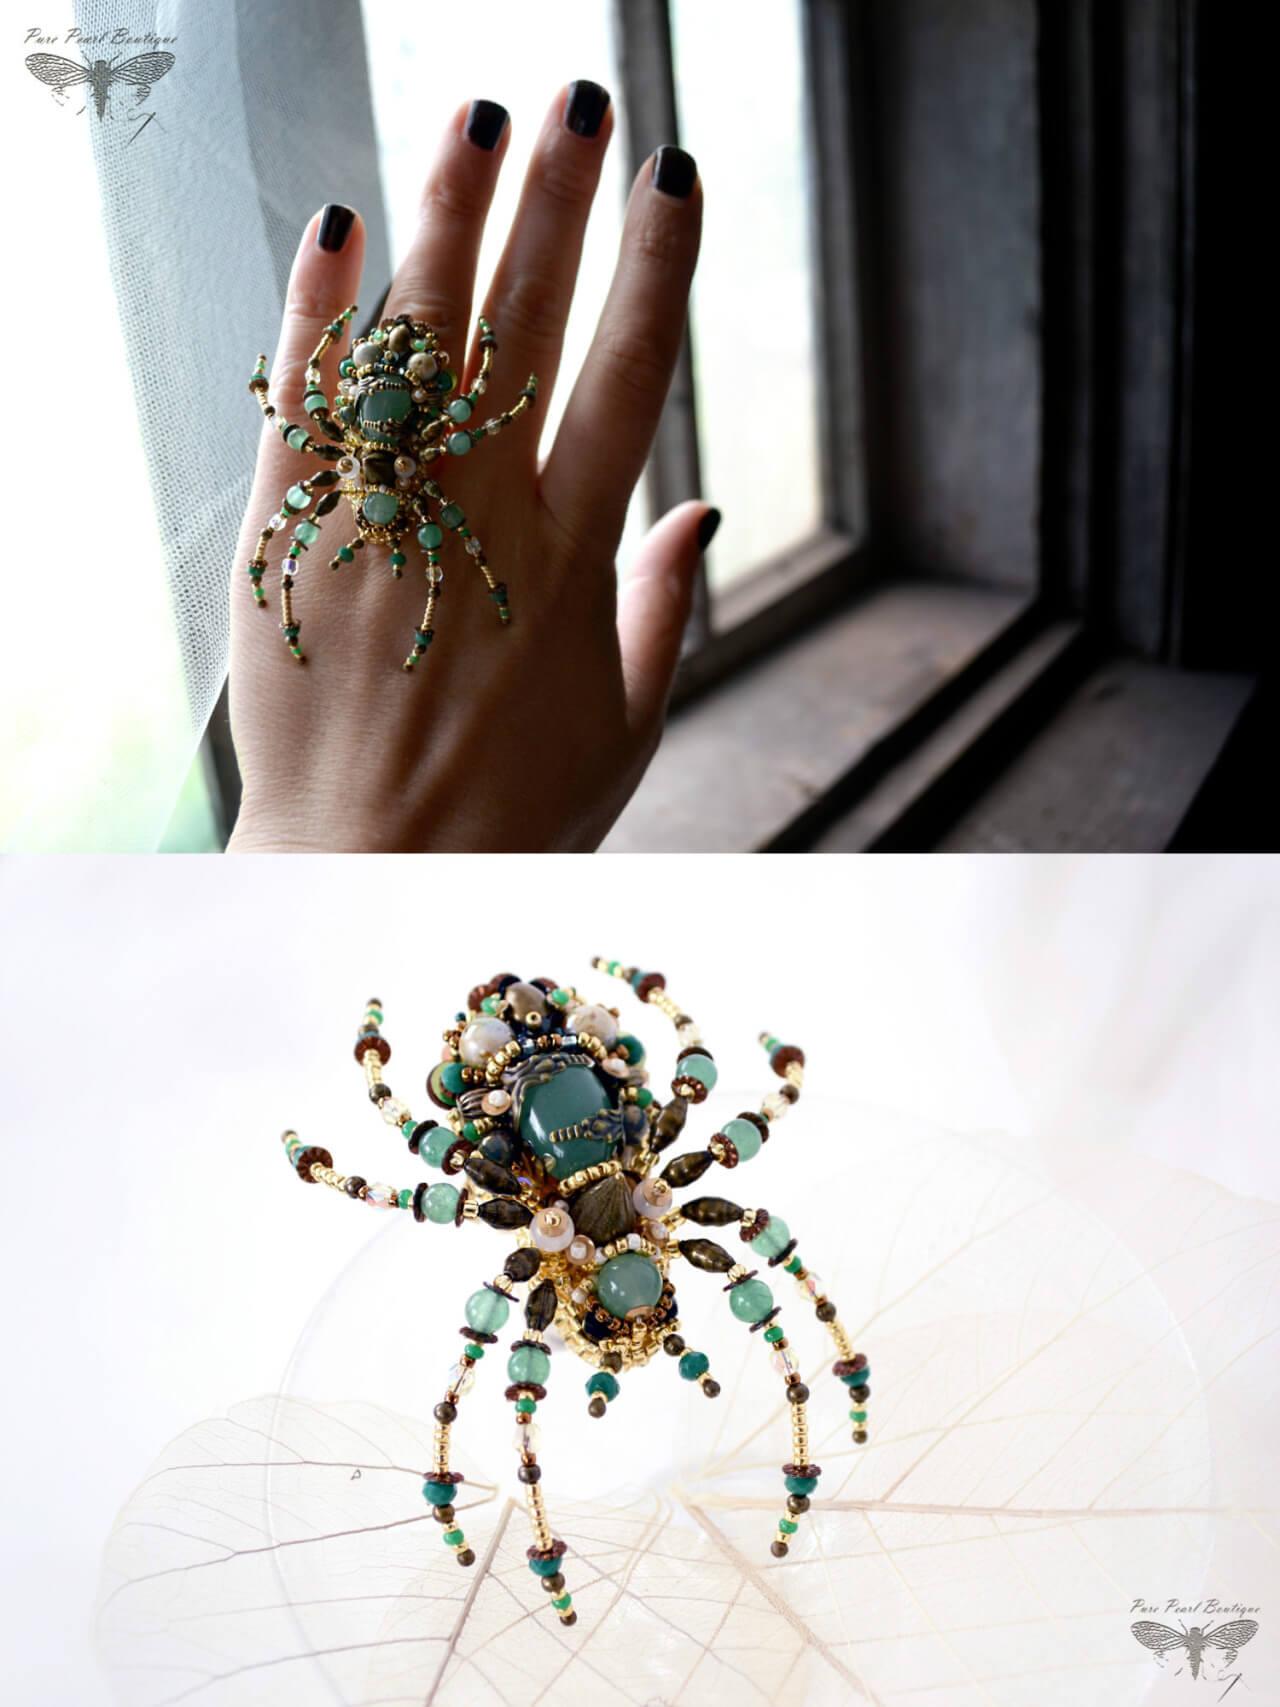 Spider Jewelry 6 (1)